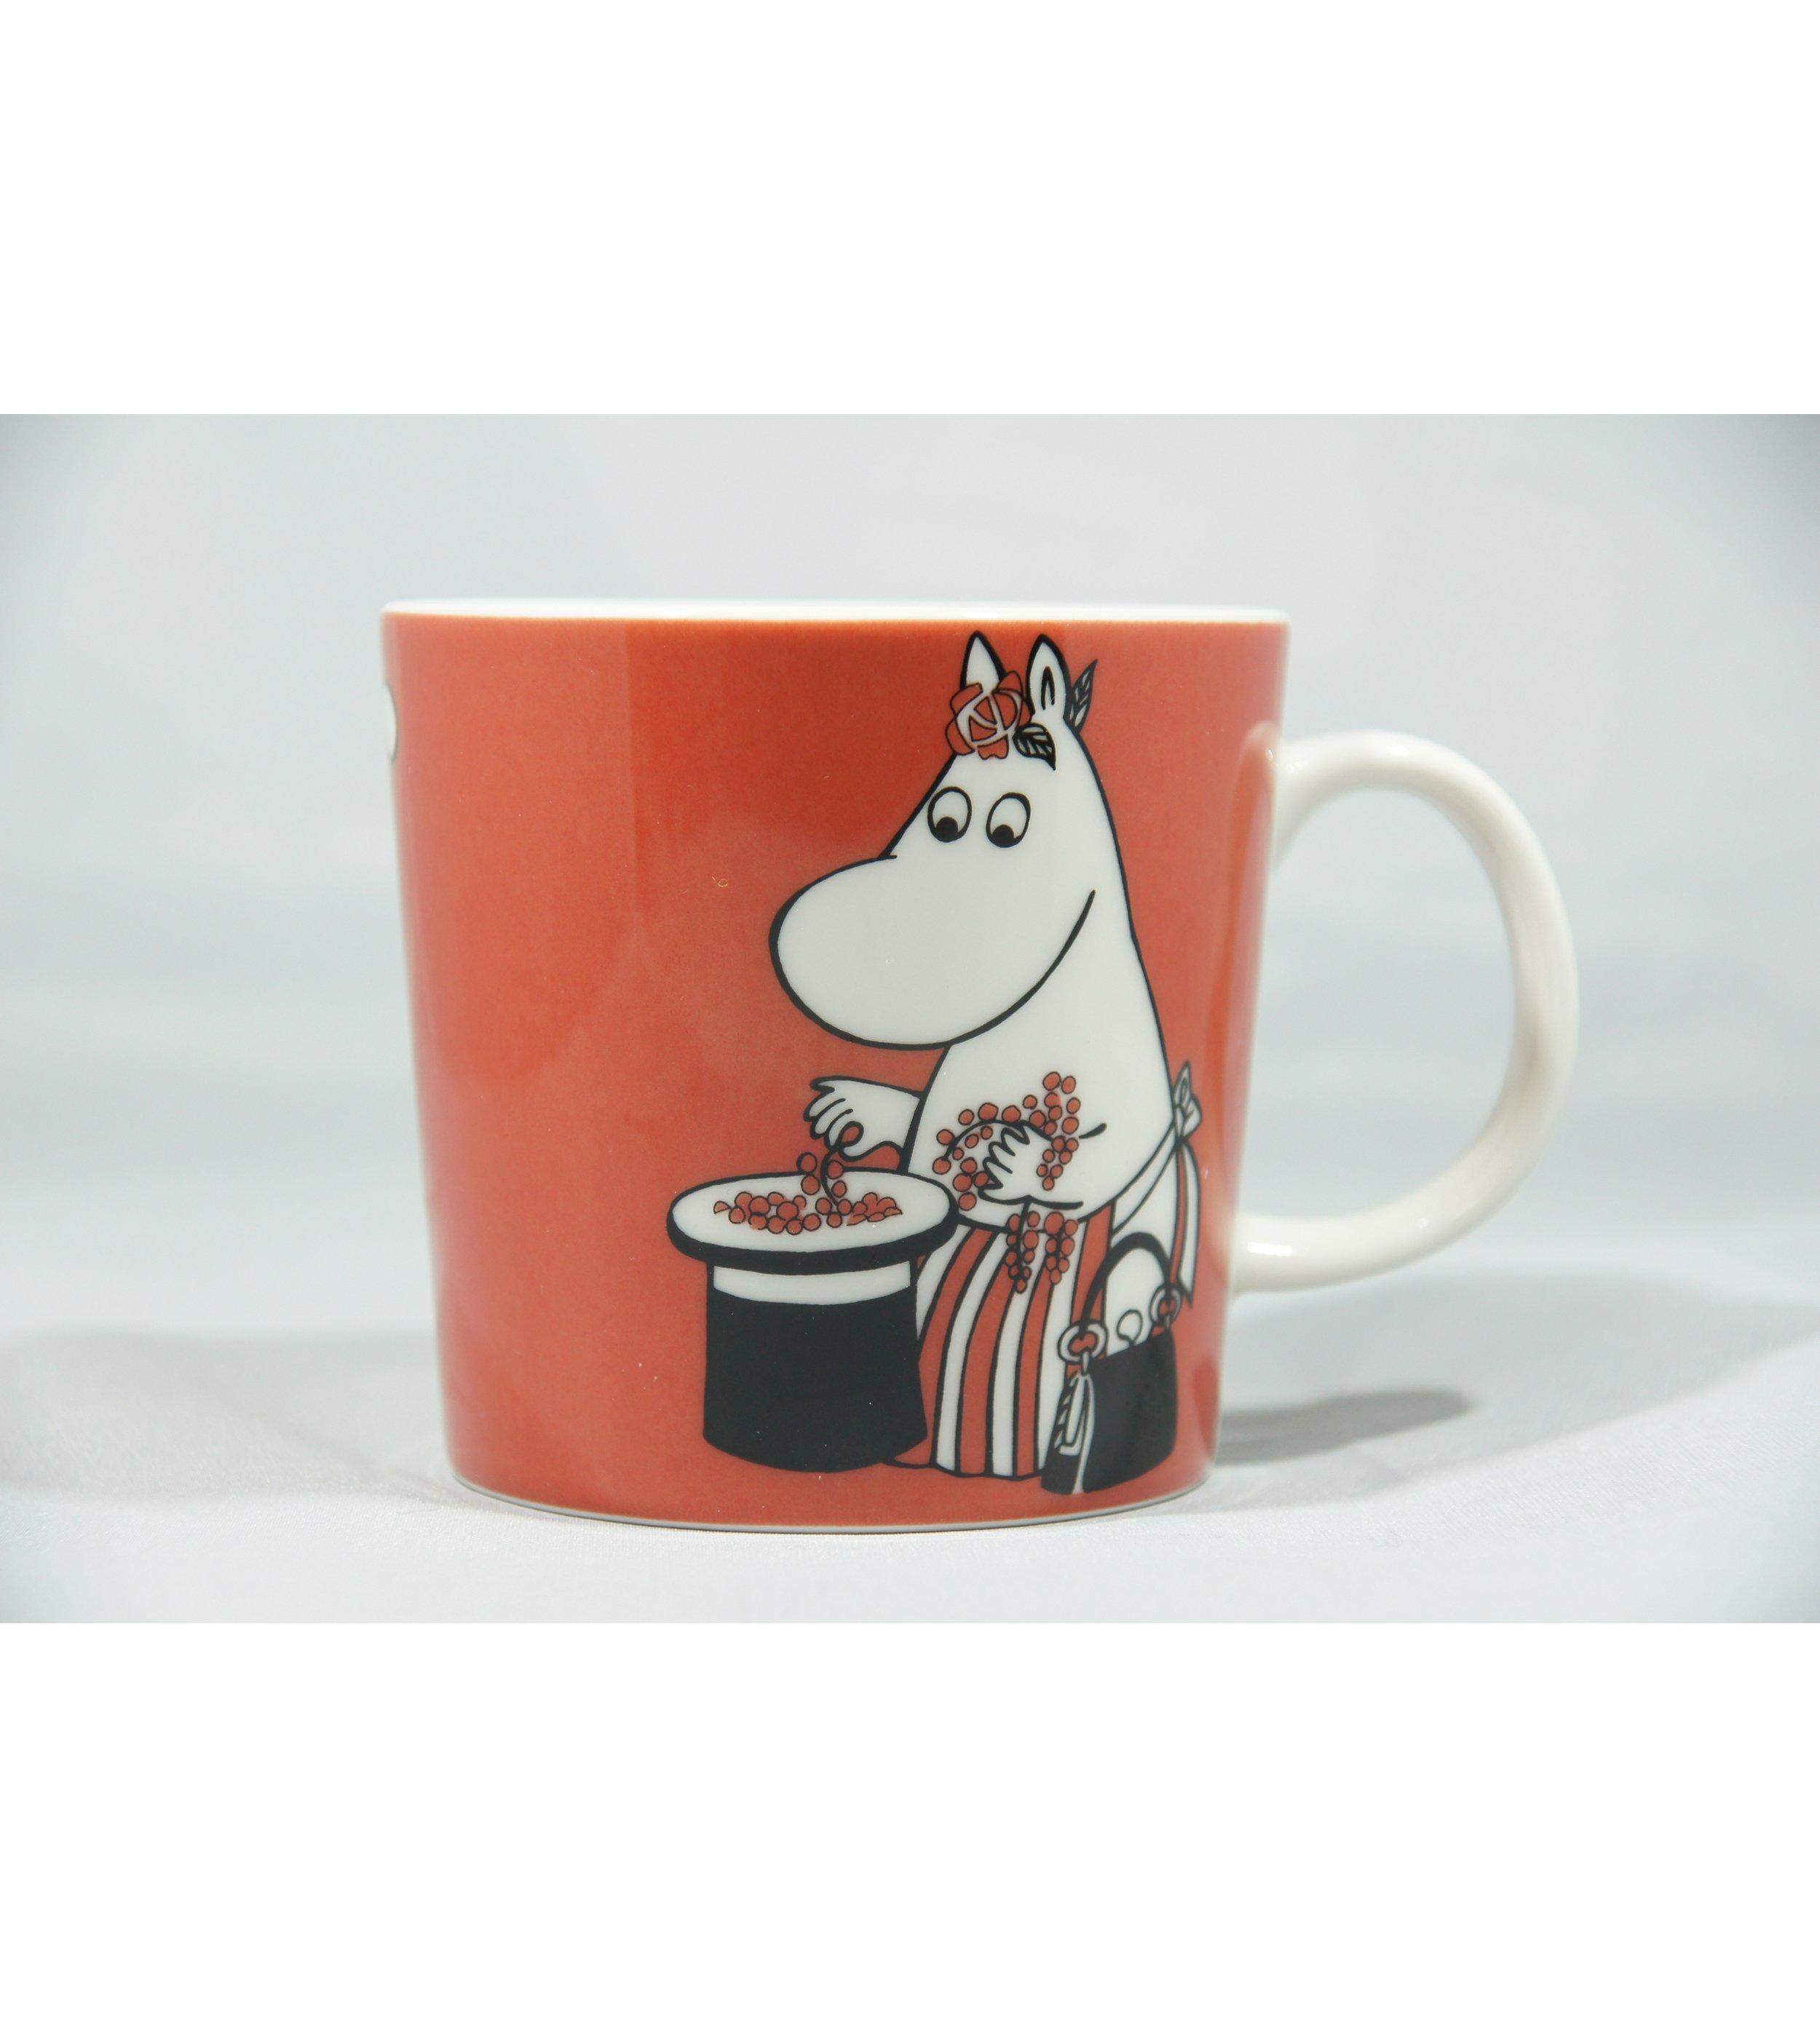 Moomin Mug Moomin Mamma and Berries